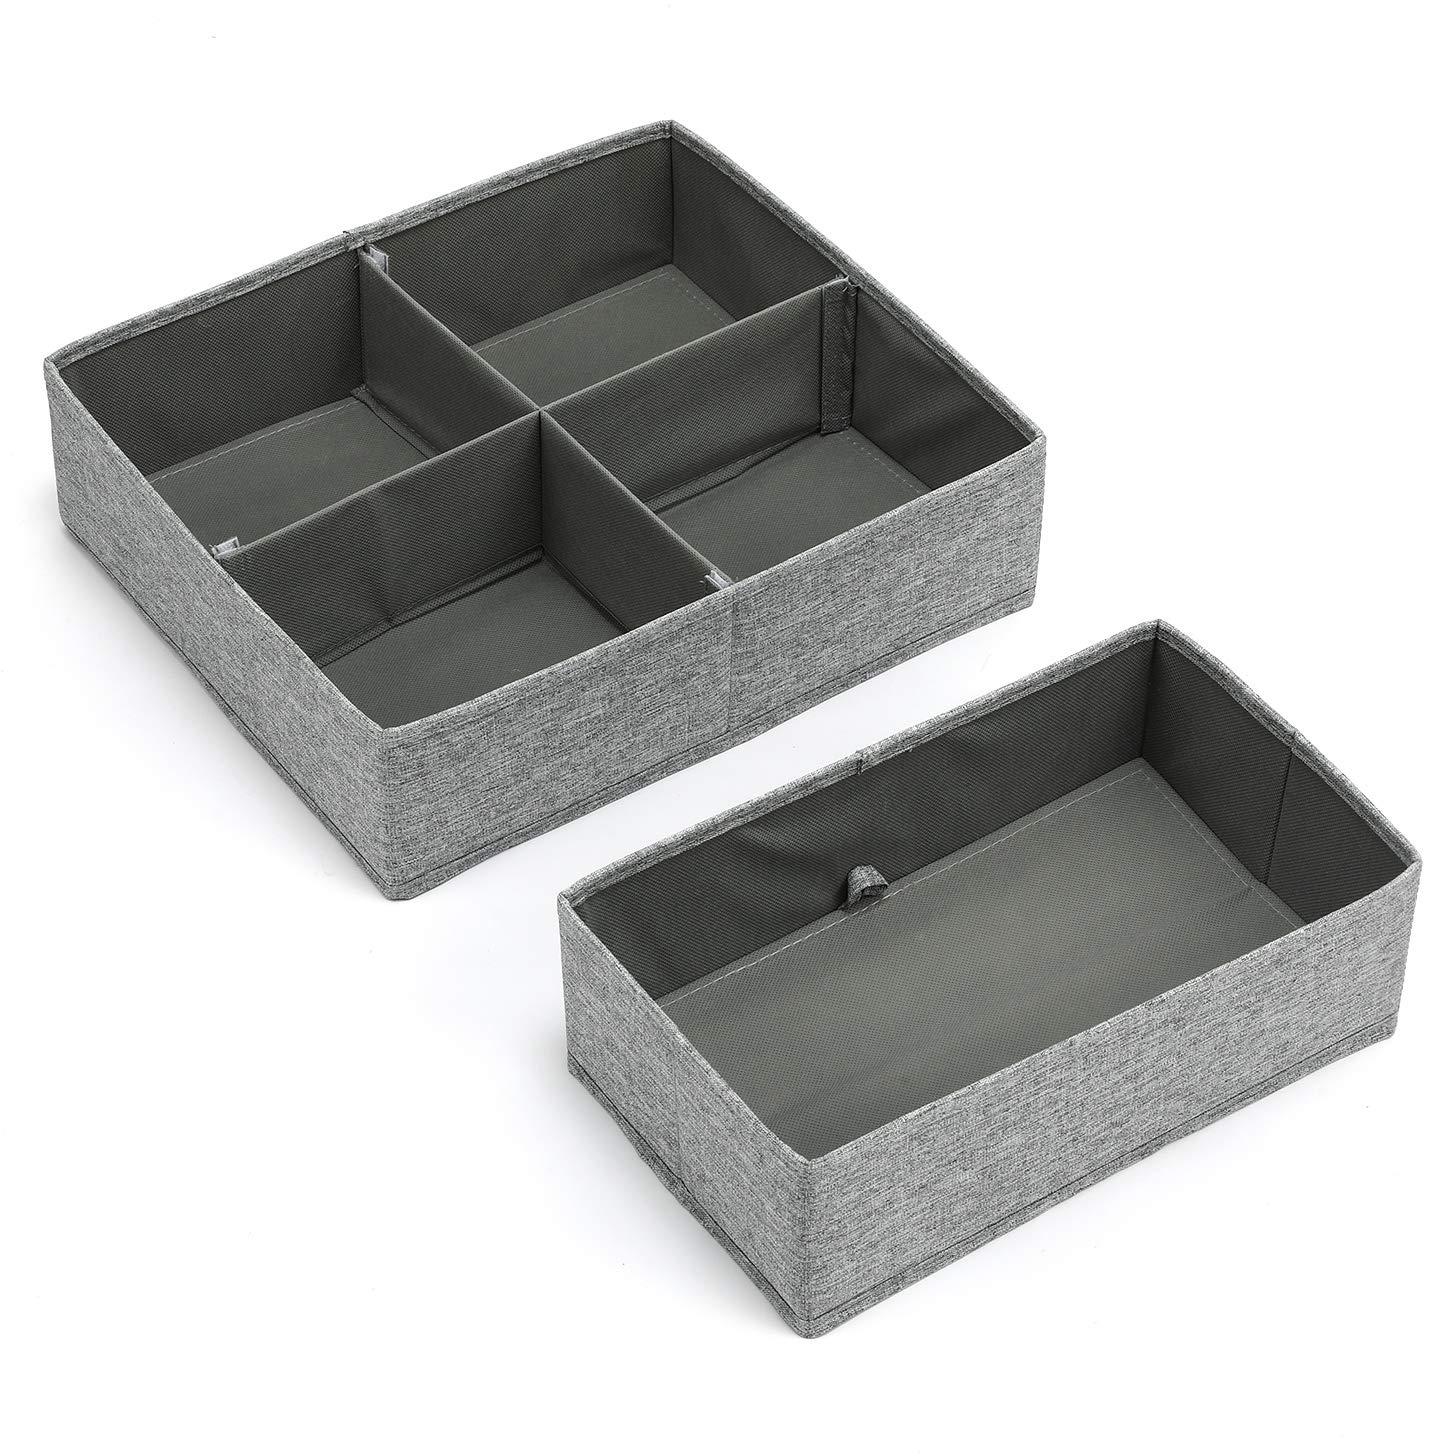 Aufbewahrungsbox Stoff Set faltbar Unterwä sche Socken Organizer Ordnungsbox Faltbox Stoffbox 2er Set (Grau) MaidMAX 903137-EU